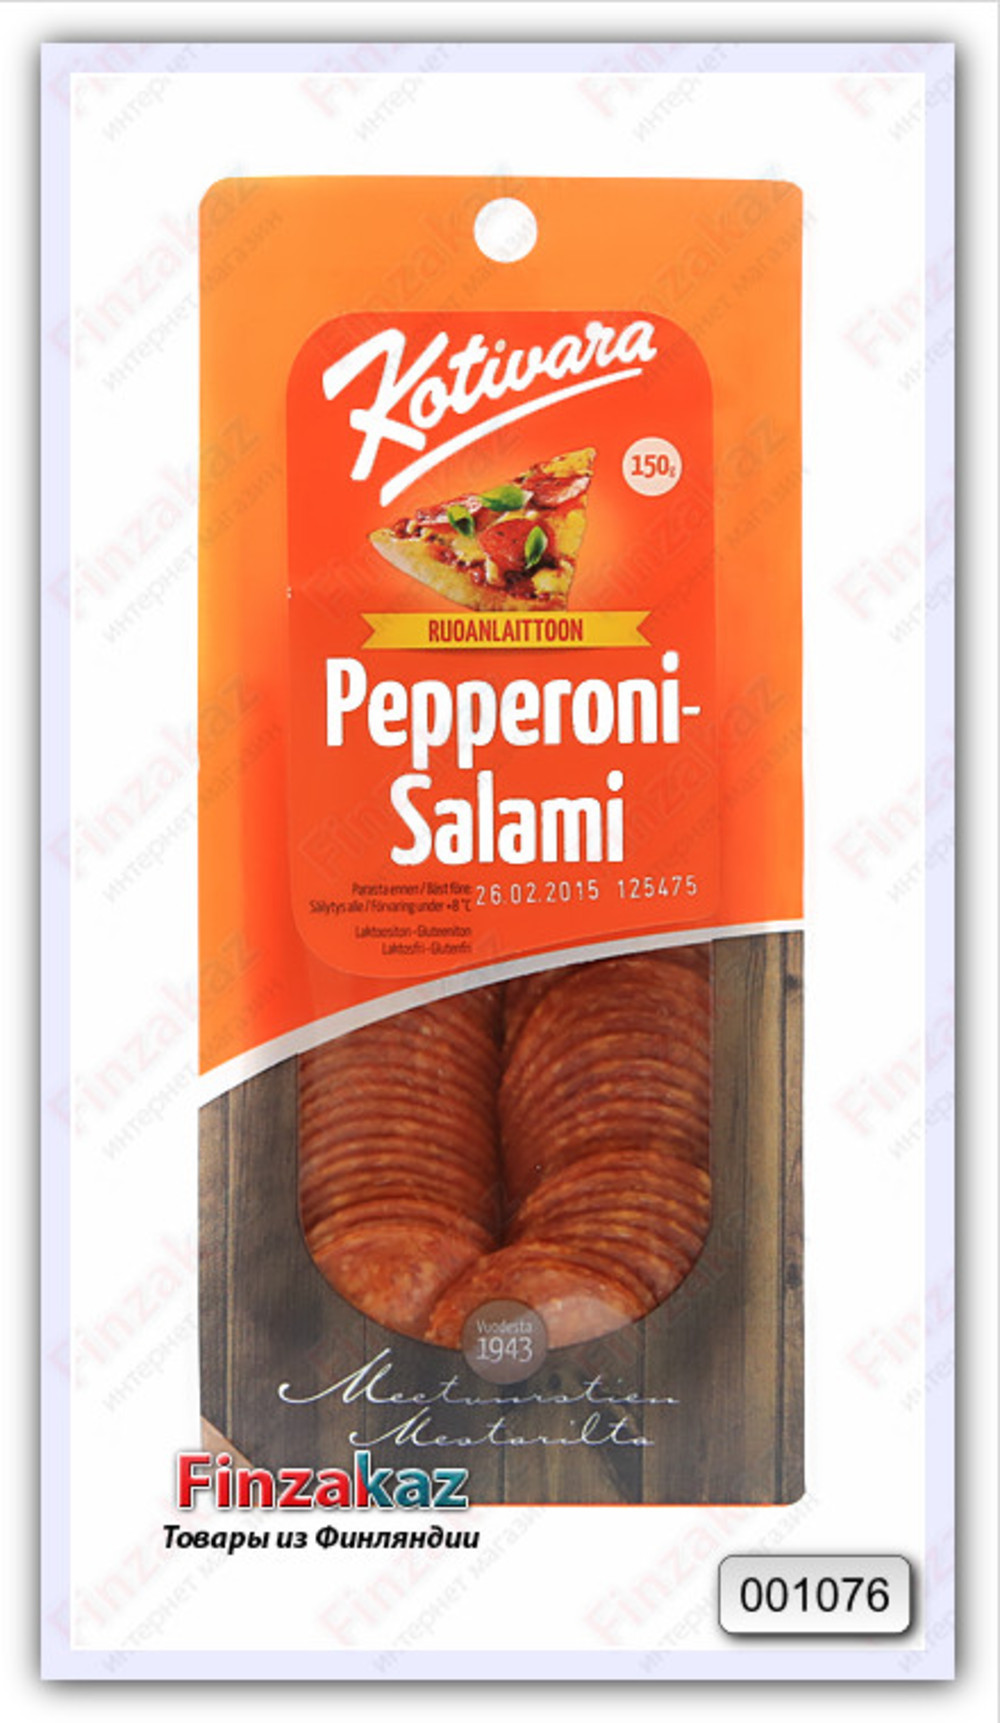 Салями Kotivara Pepperoni Salami (нарезка) 150 гр